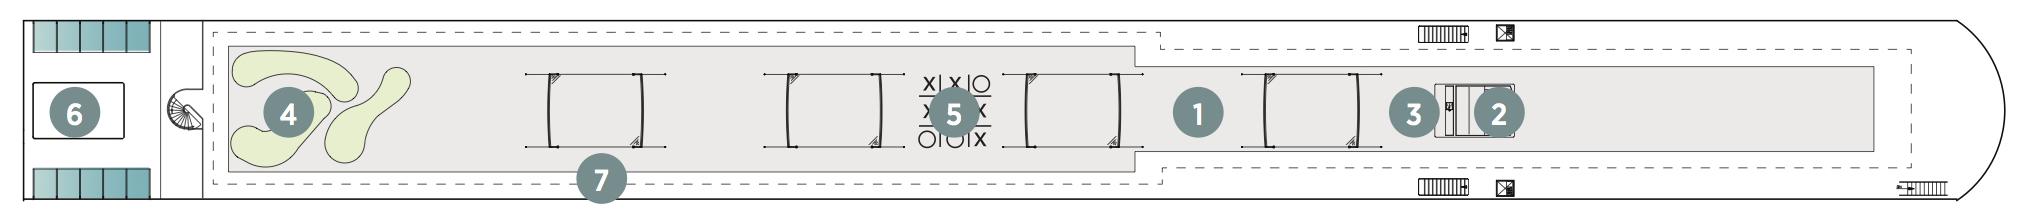 Emerald Sky-deckplan-Sun Deck